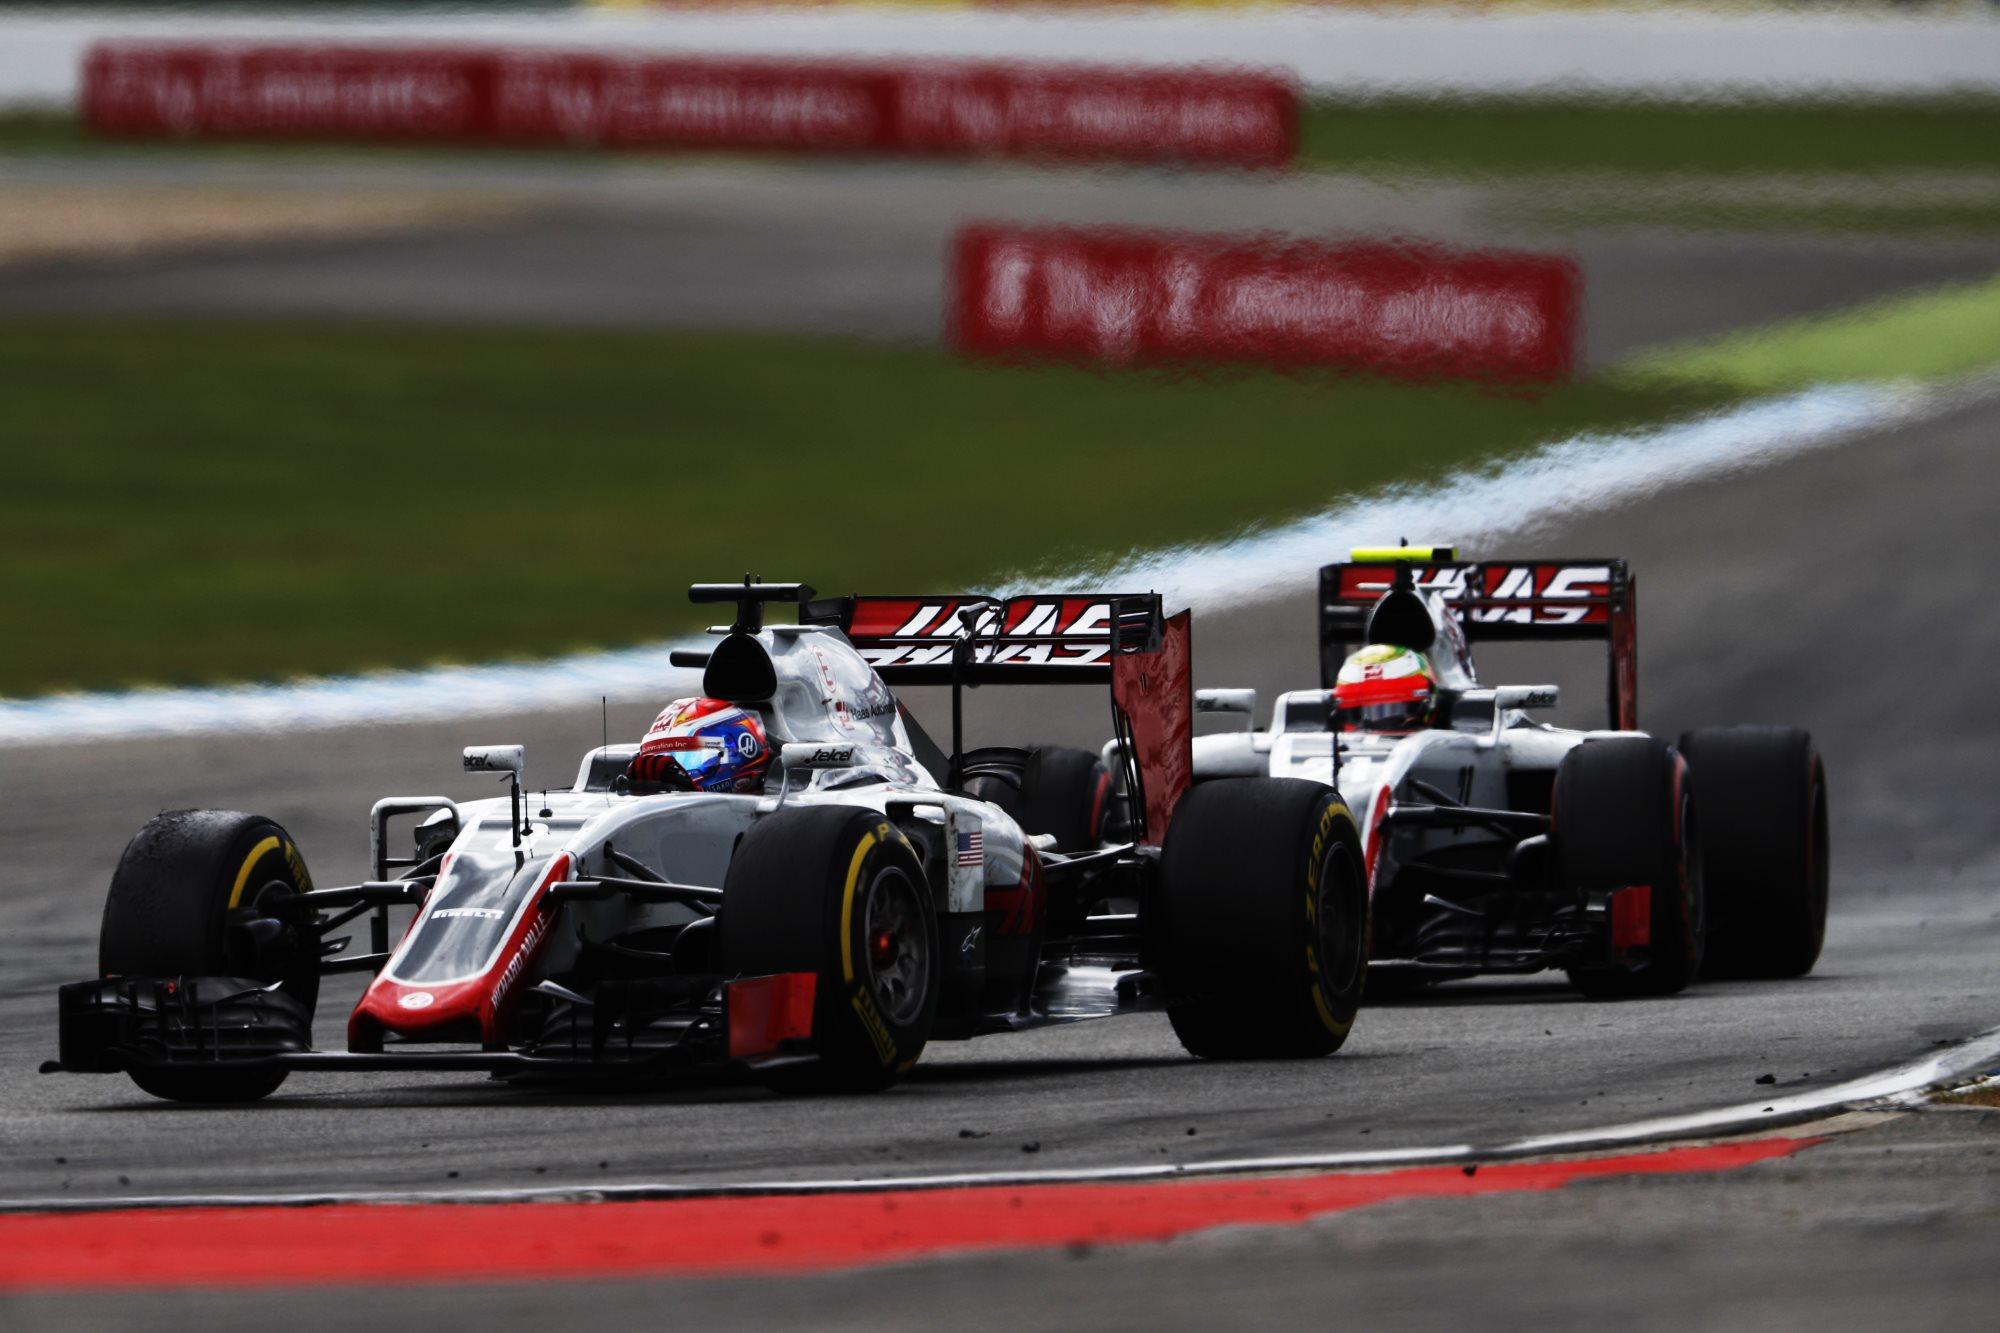 Romain Grosjean and Esteban Gutierrez Haas VF-16 Ferrari Gerrman GP f1 2016 Foto Haas